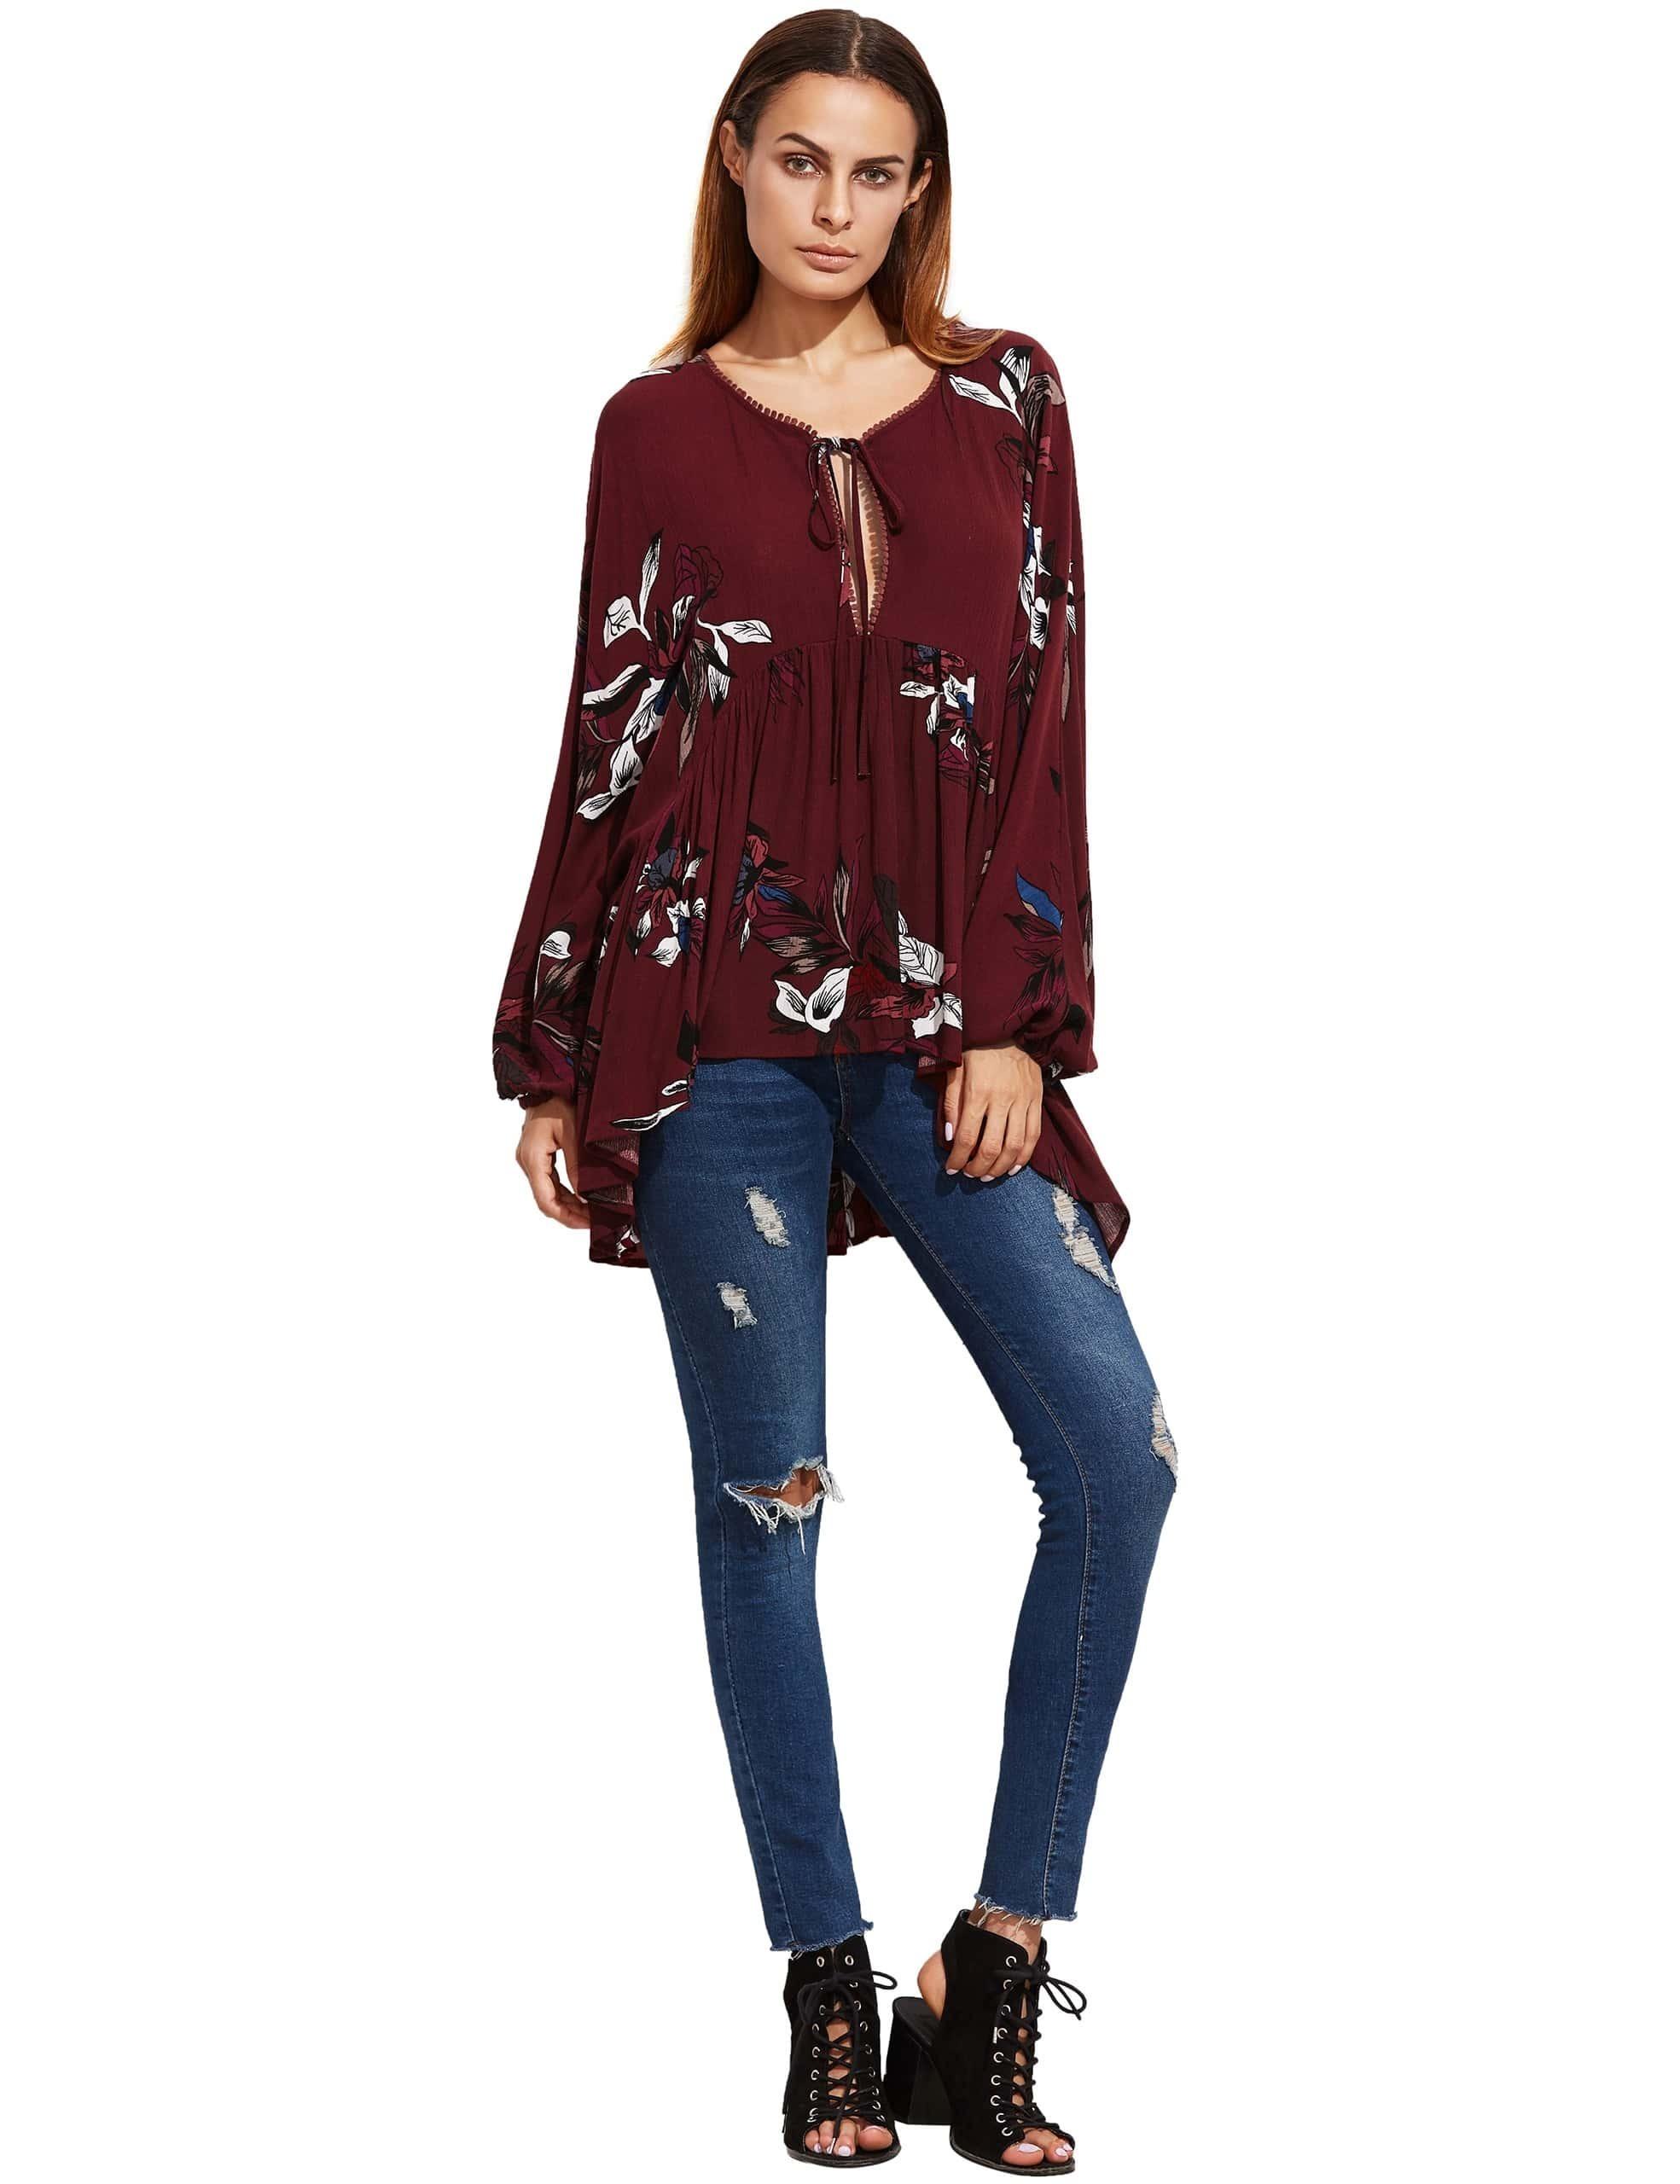 blouse161017470_2